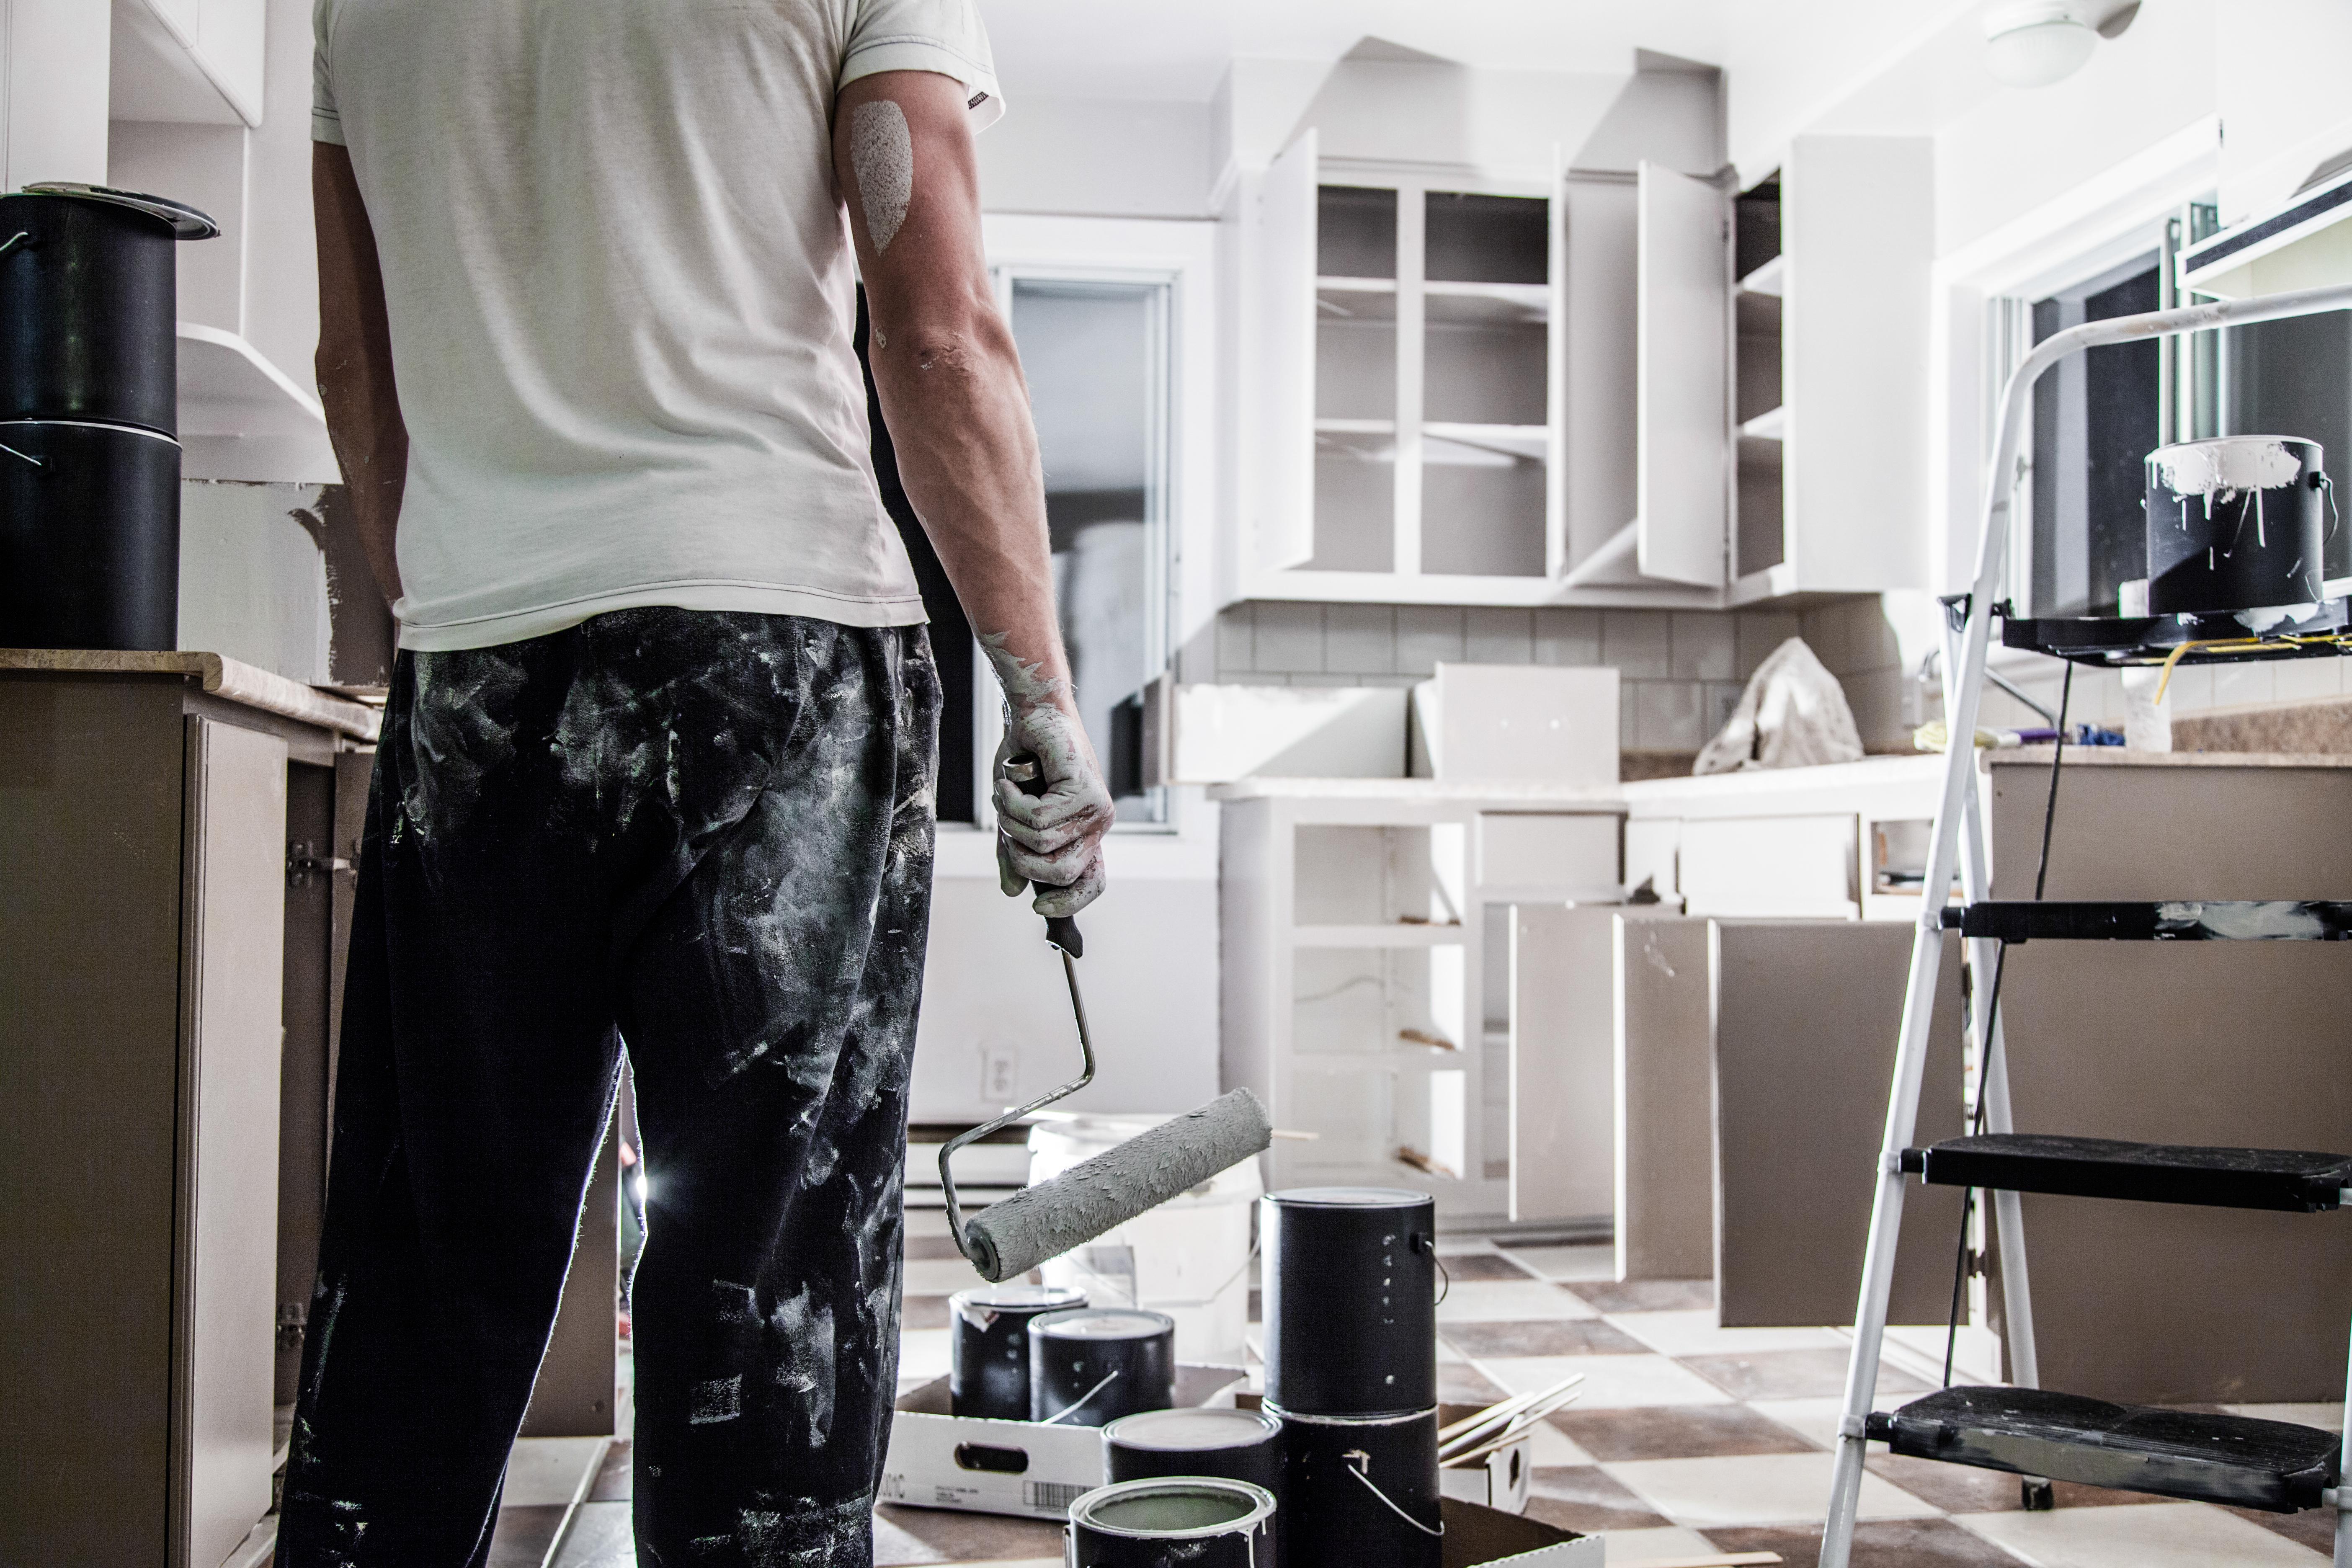 man repainting kitchen